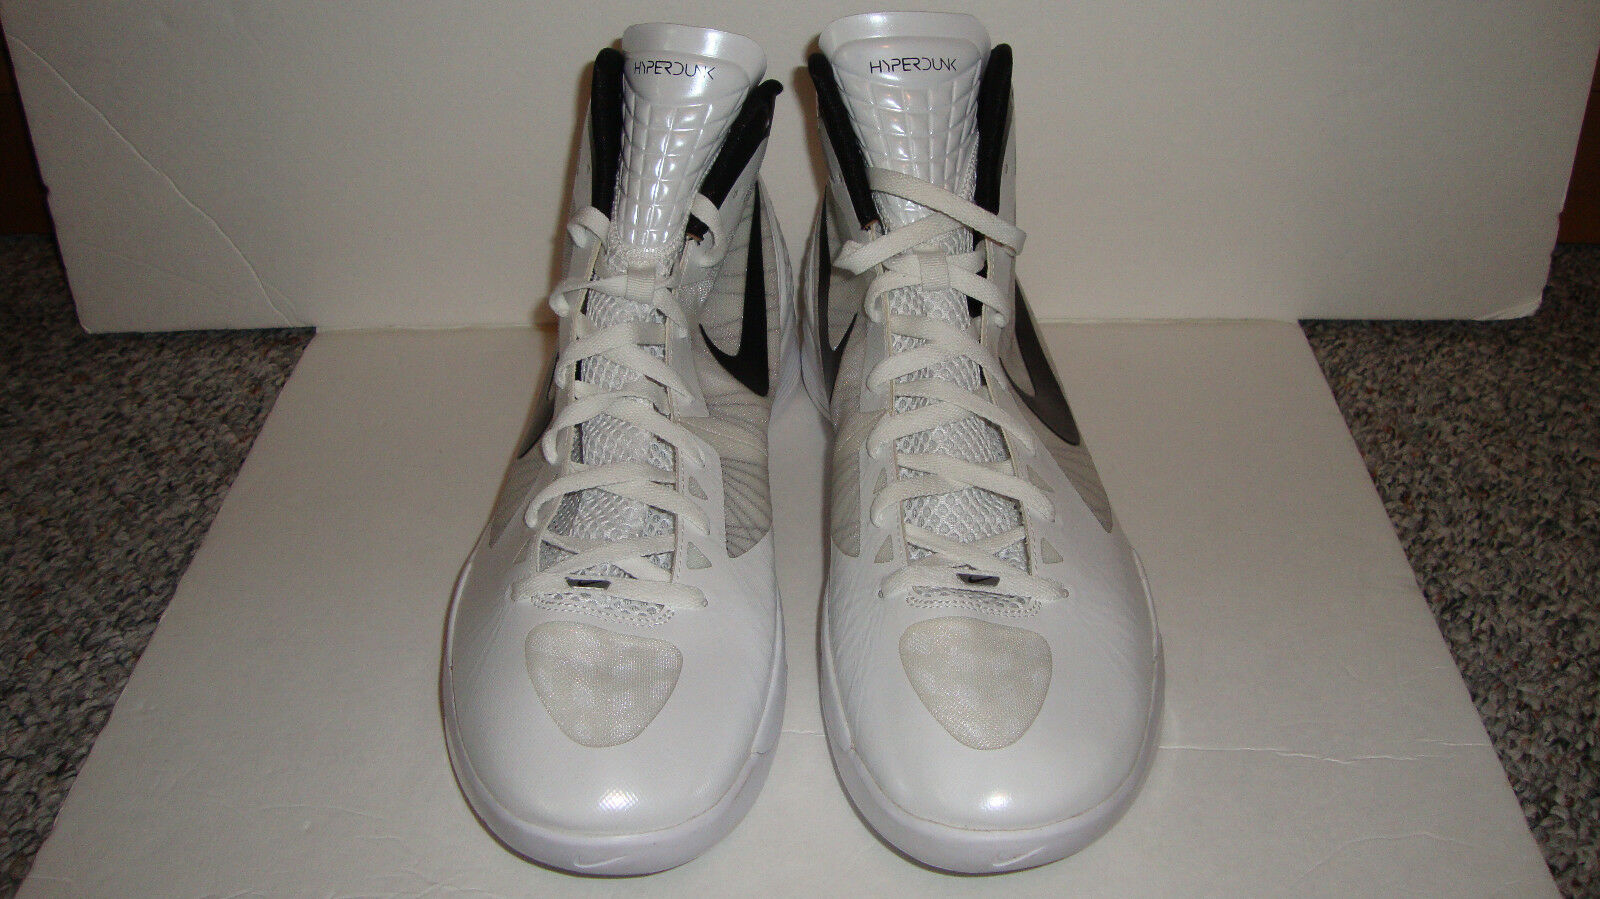 RARE PROMO PROMO RARE NIKE ZOOM HYPERDUNK 2011 454138-888 White/Black-Met Silver  SIZE 17 31e11c